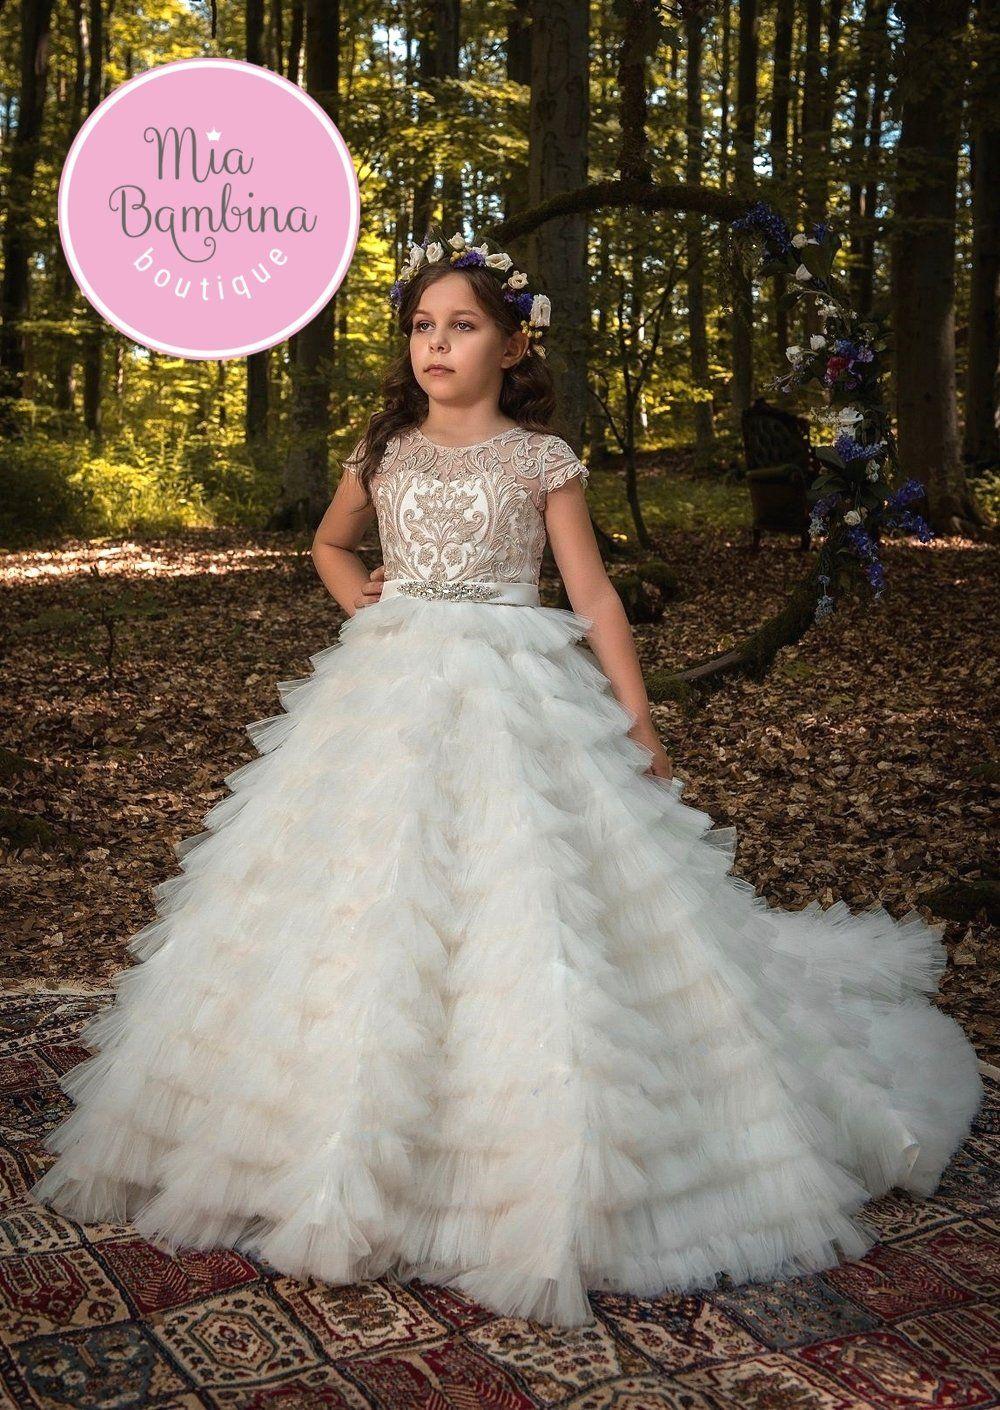 6a99d7272 Flower Girl Dresses Veracruz ivory and gold flower girl dress with ...